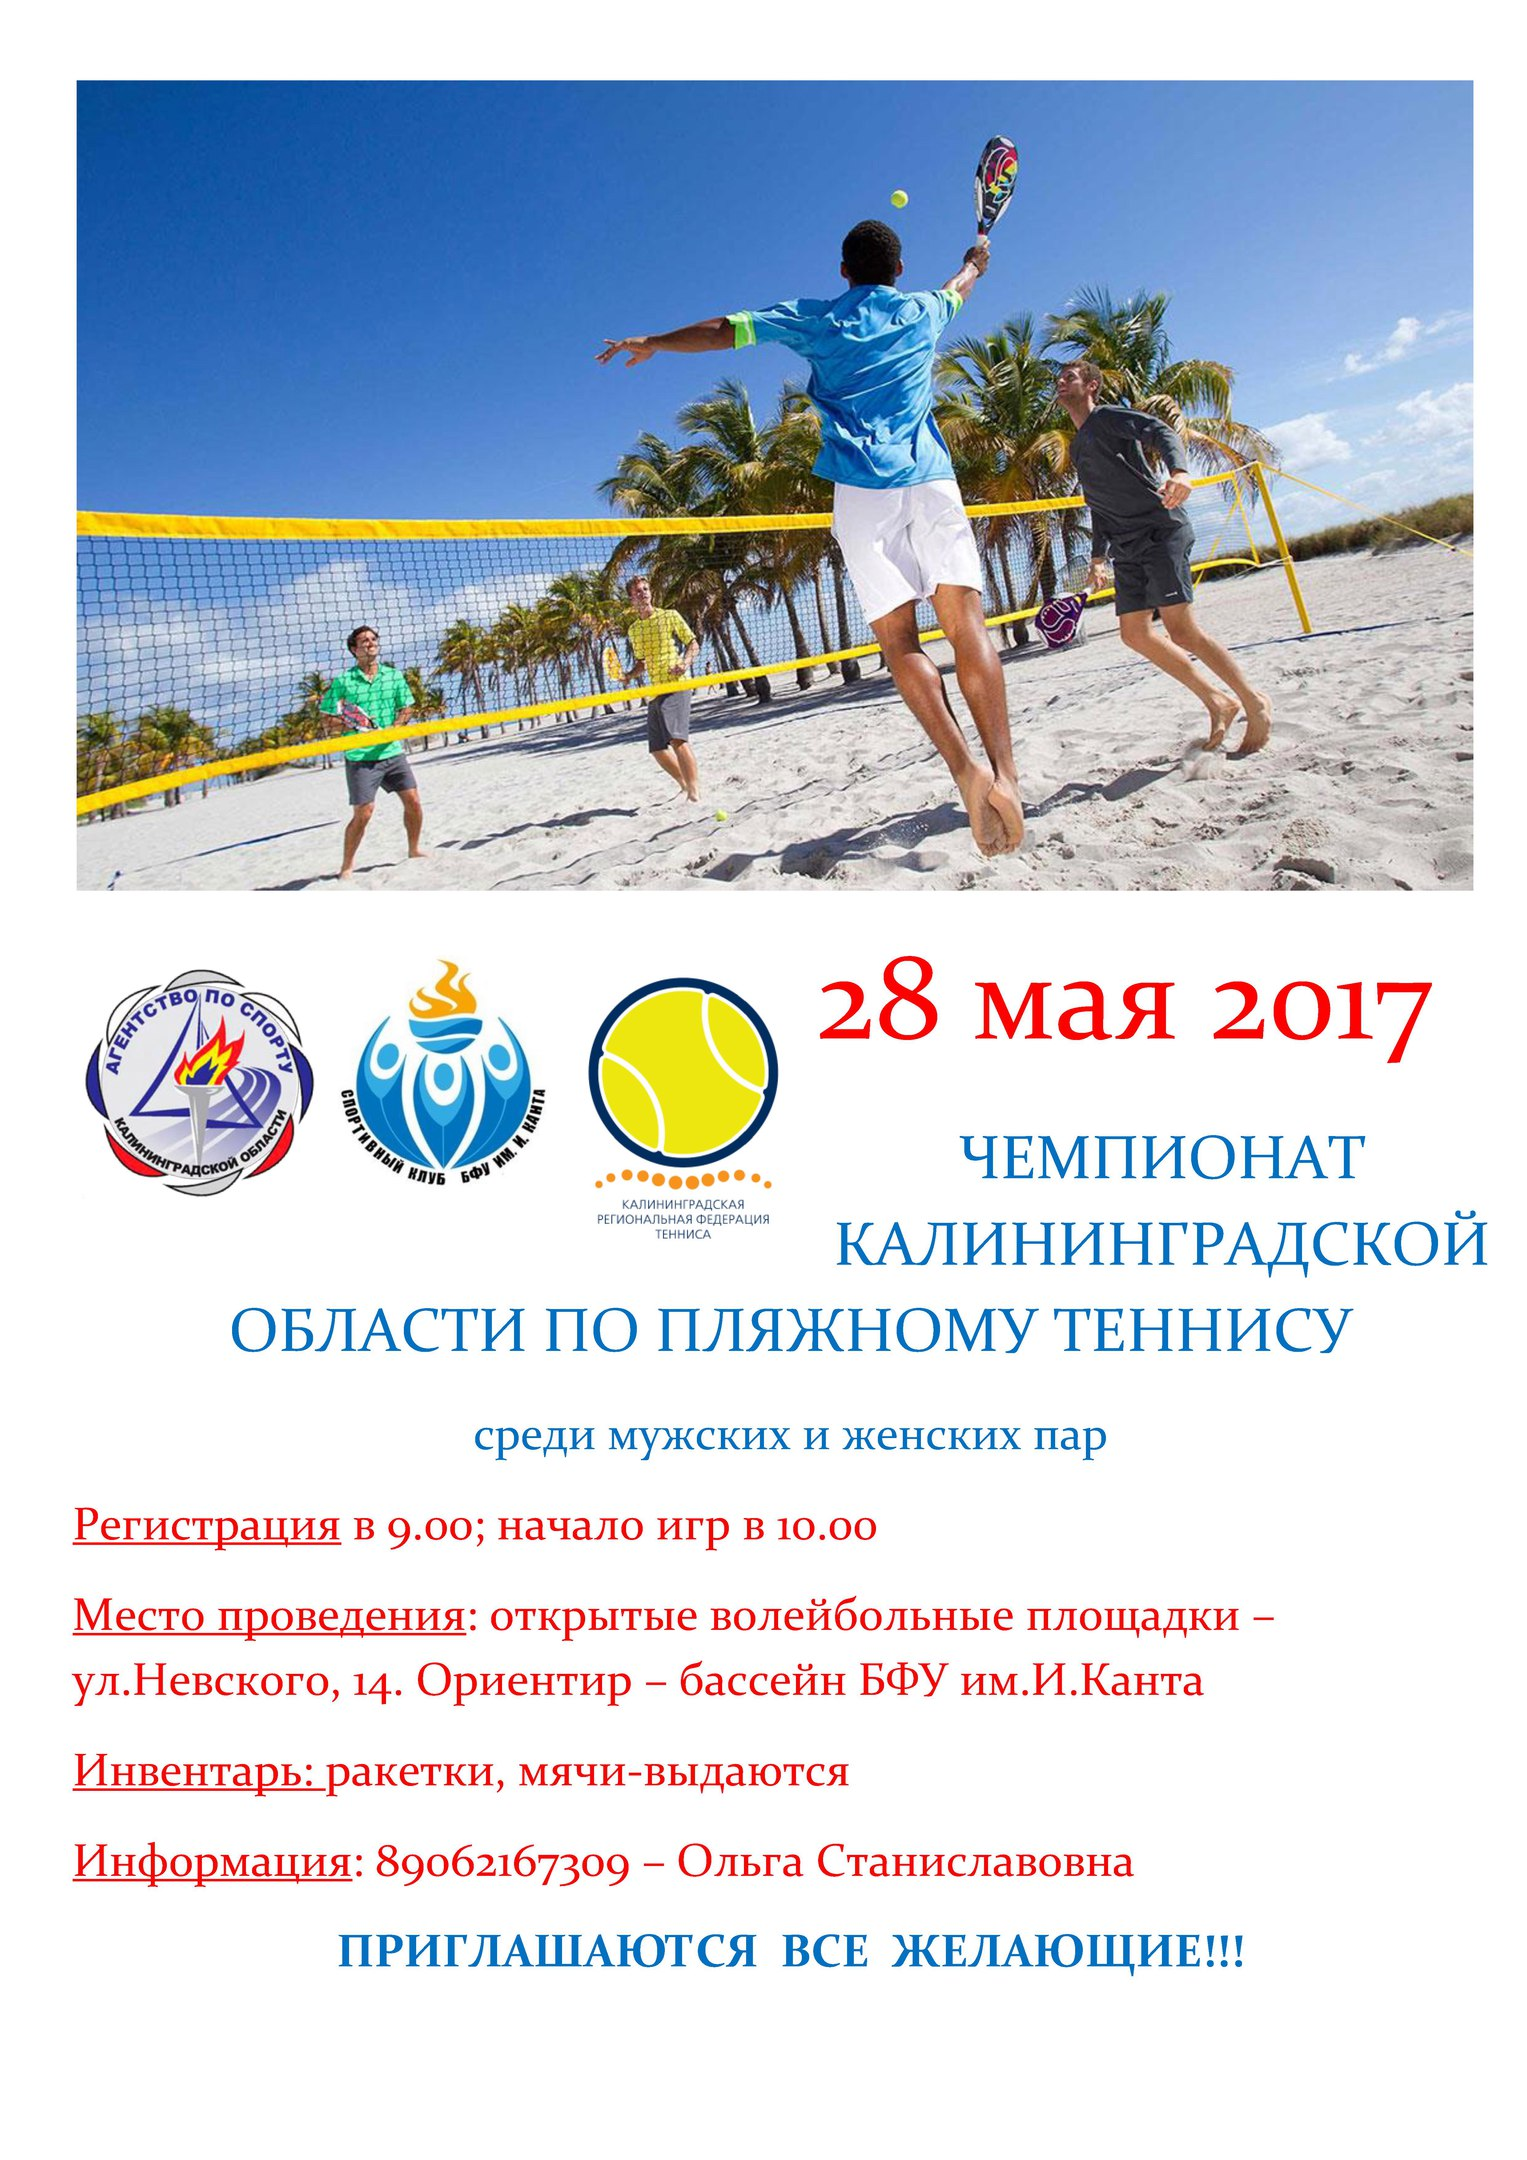 anons-tennis-beach-sportkaliningrad